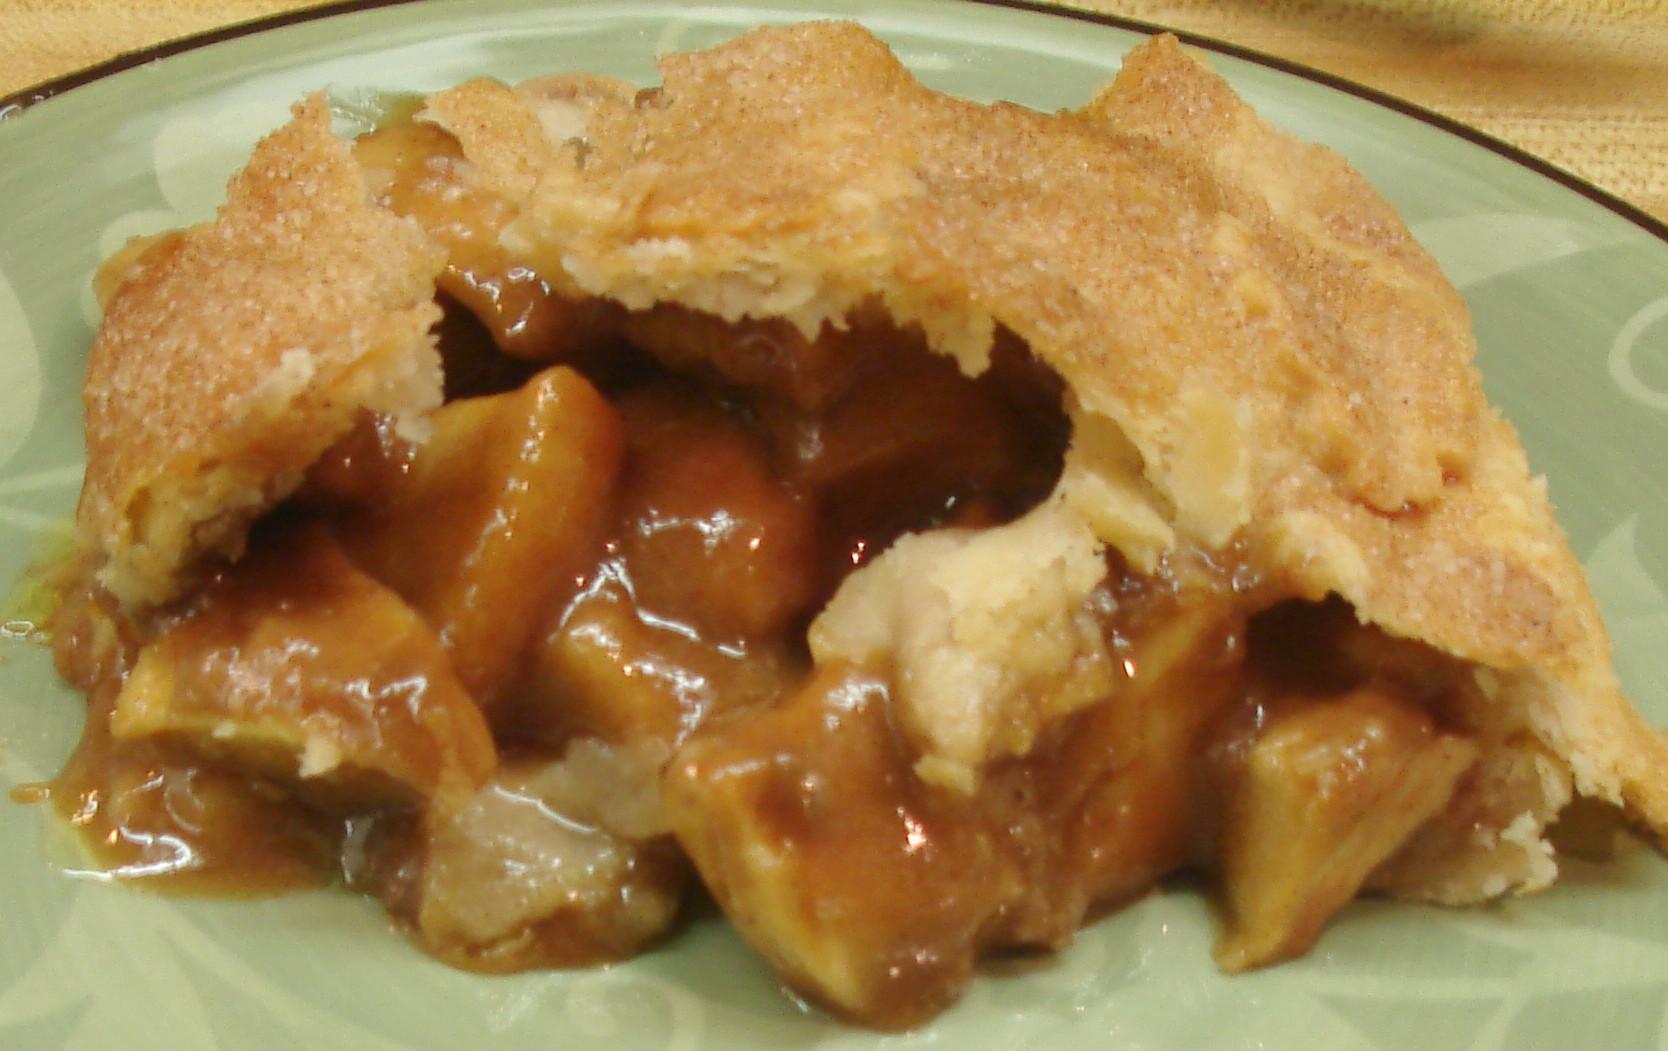 Best Apple Pie Apples  The Best Apple Pie Ever